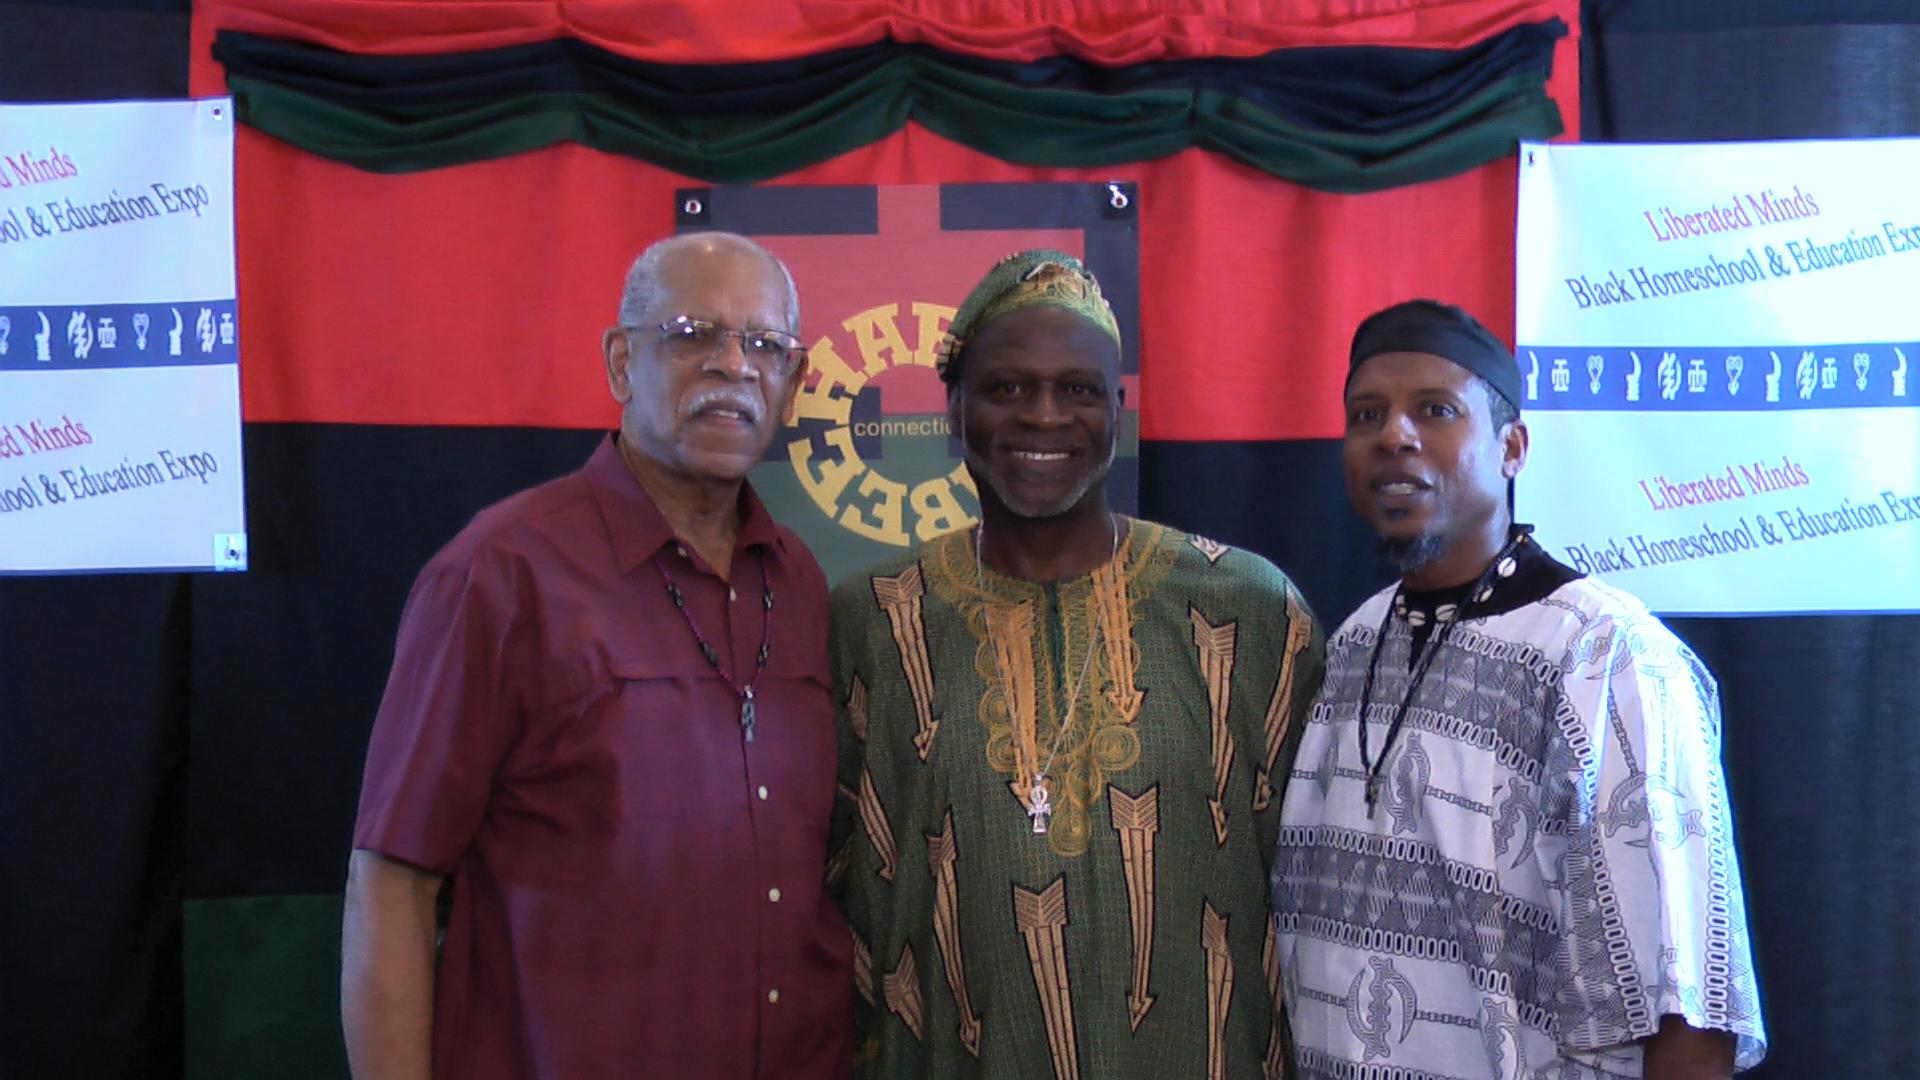 Baba Mxolisi, Mehib & Amenseph